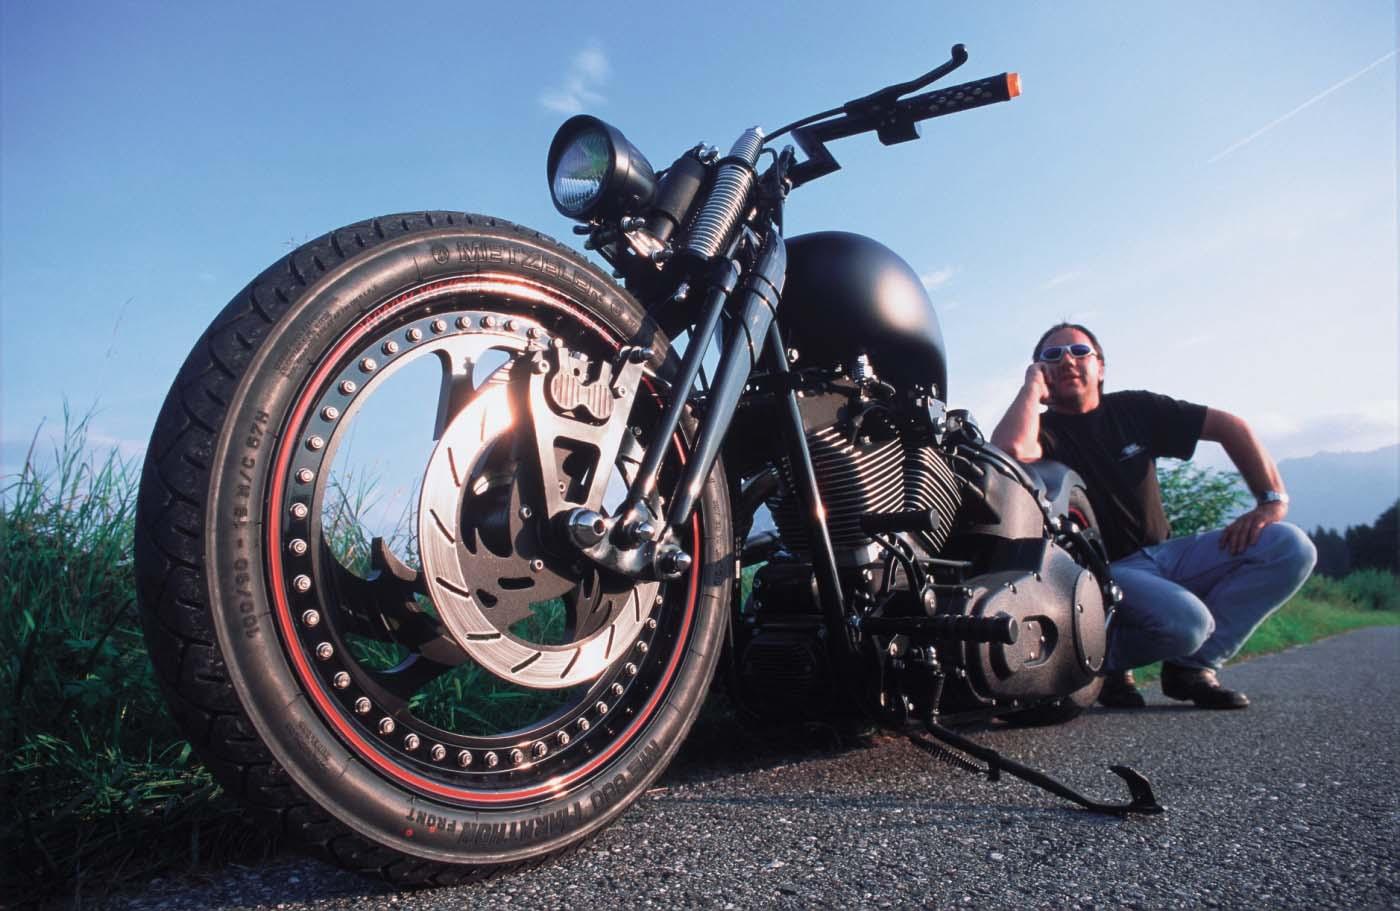 Rick vor seinem personal Bike TGIR 2002